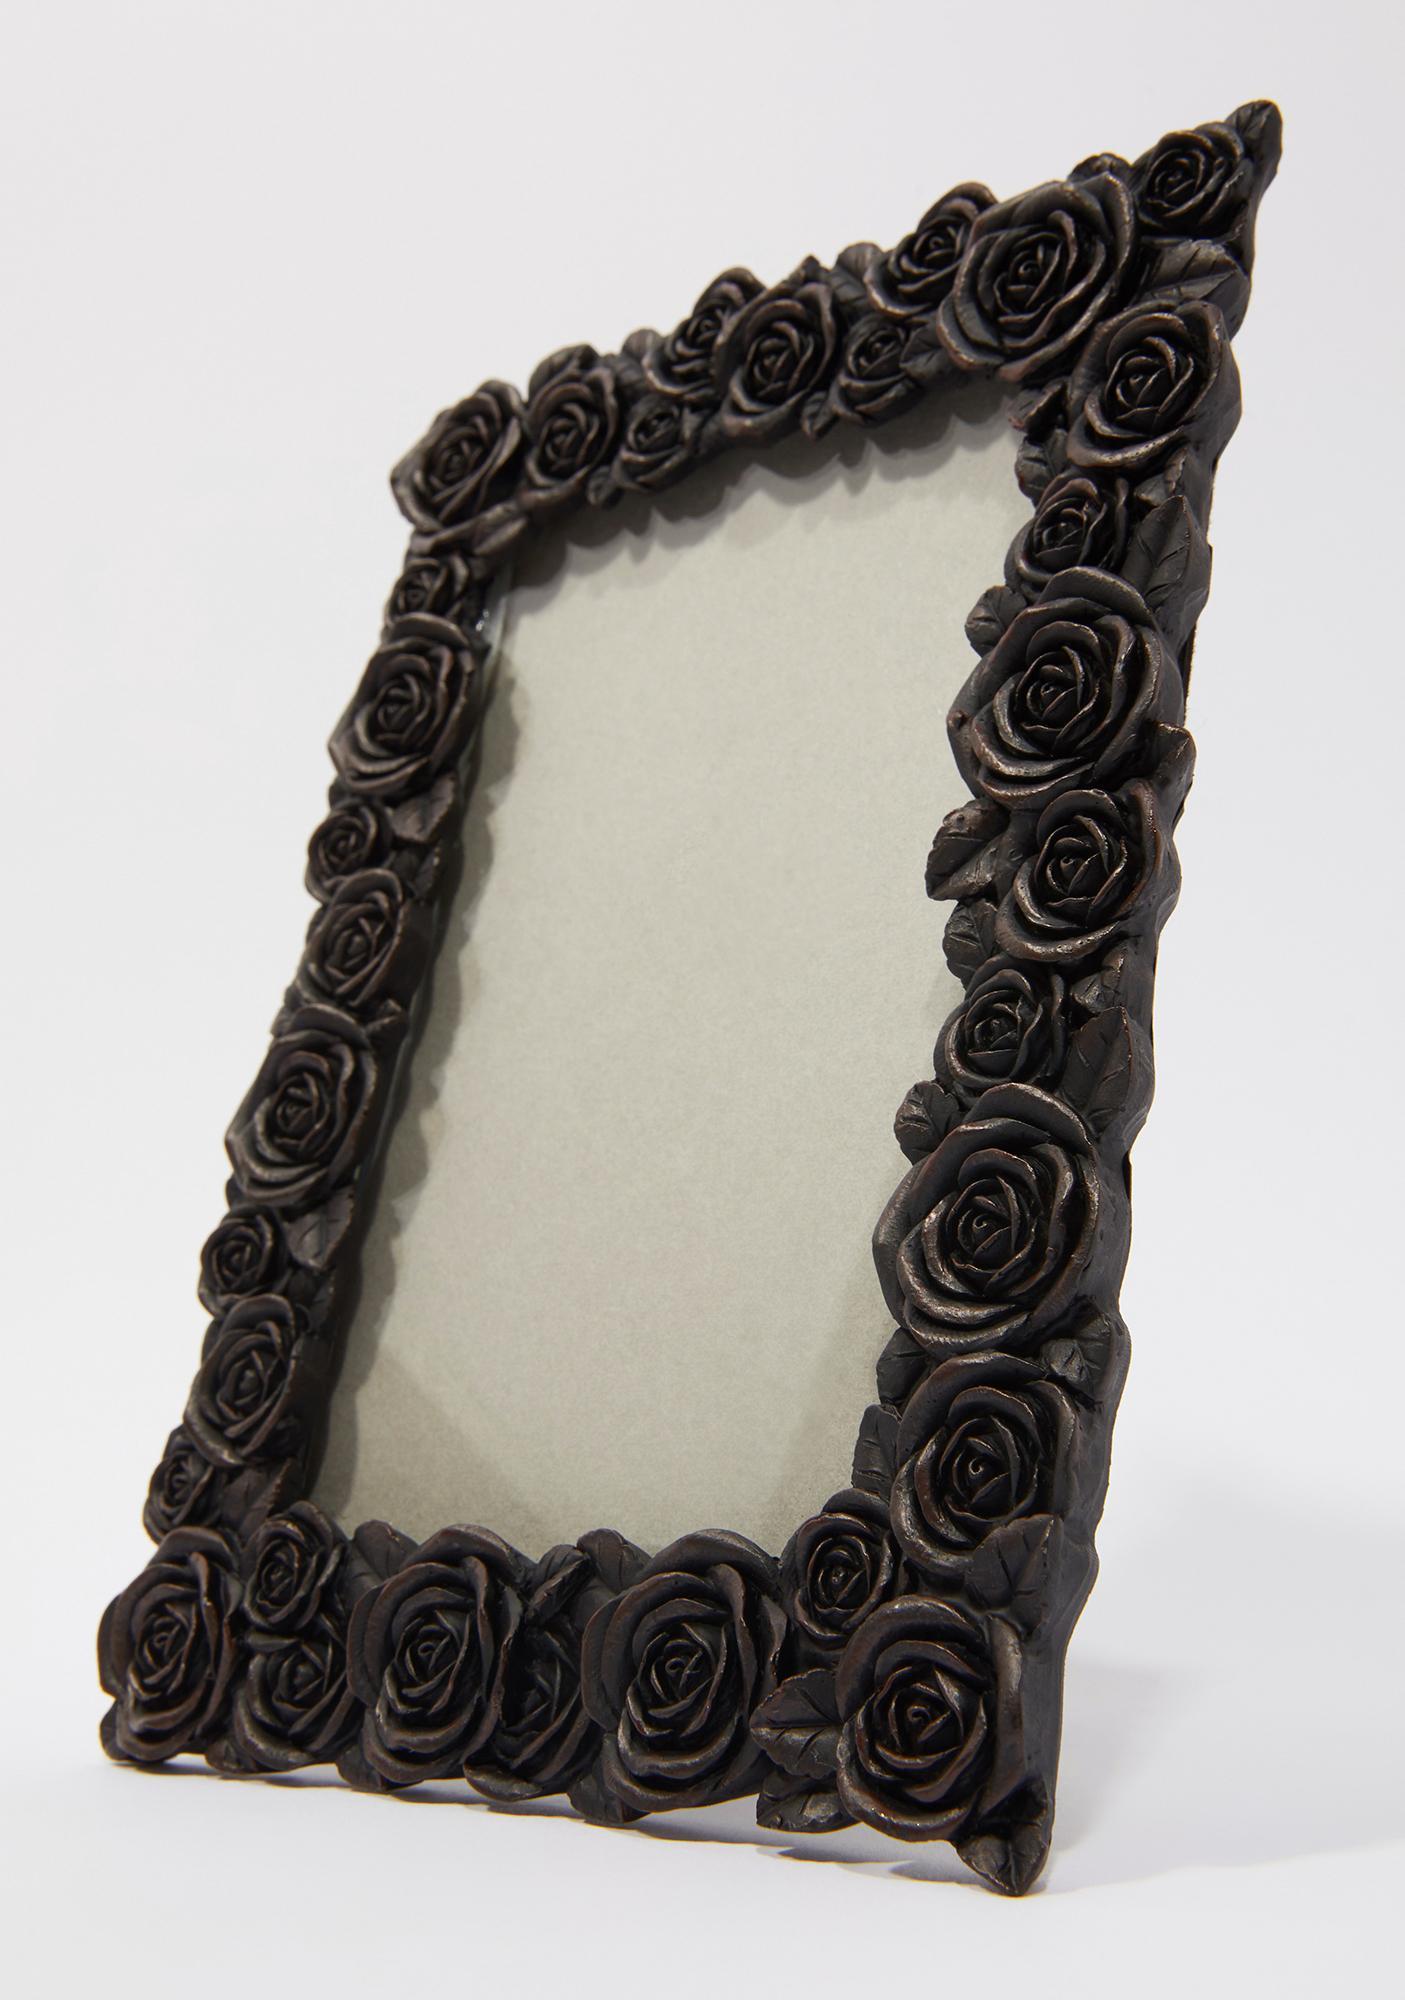 Alchemy England Rose Photo Frame